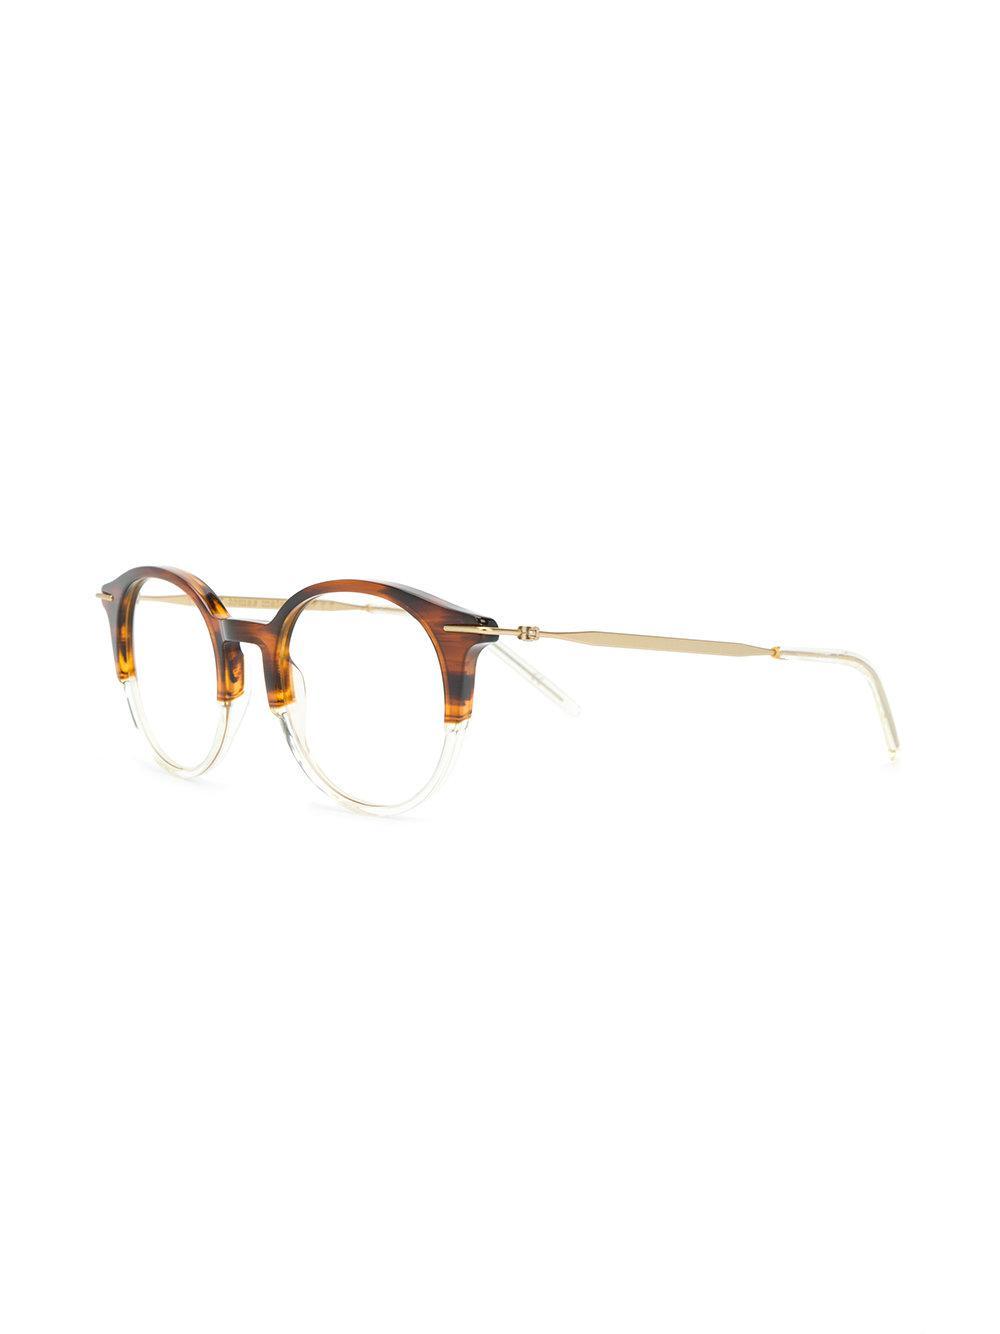 f7e2ada49a0 Tomas Maier - Brown Square Glasses - Lyst. View fullscreen